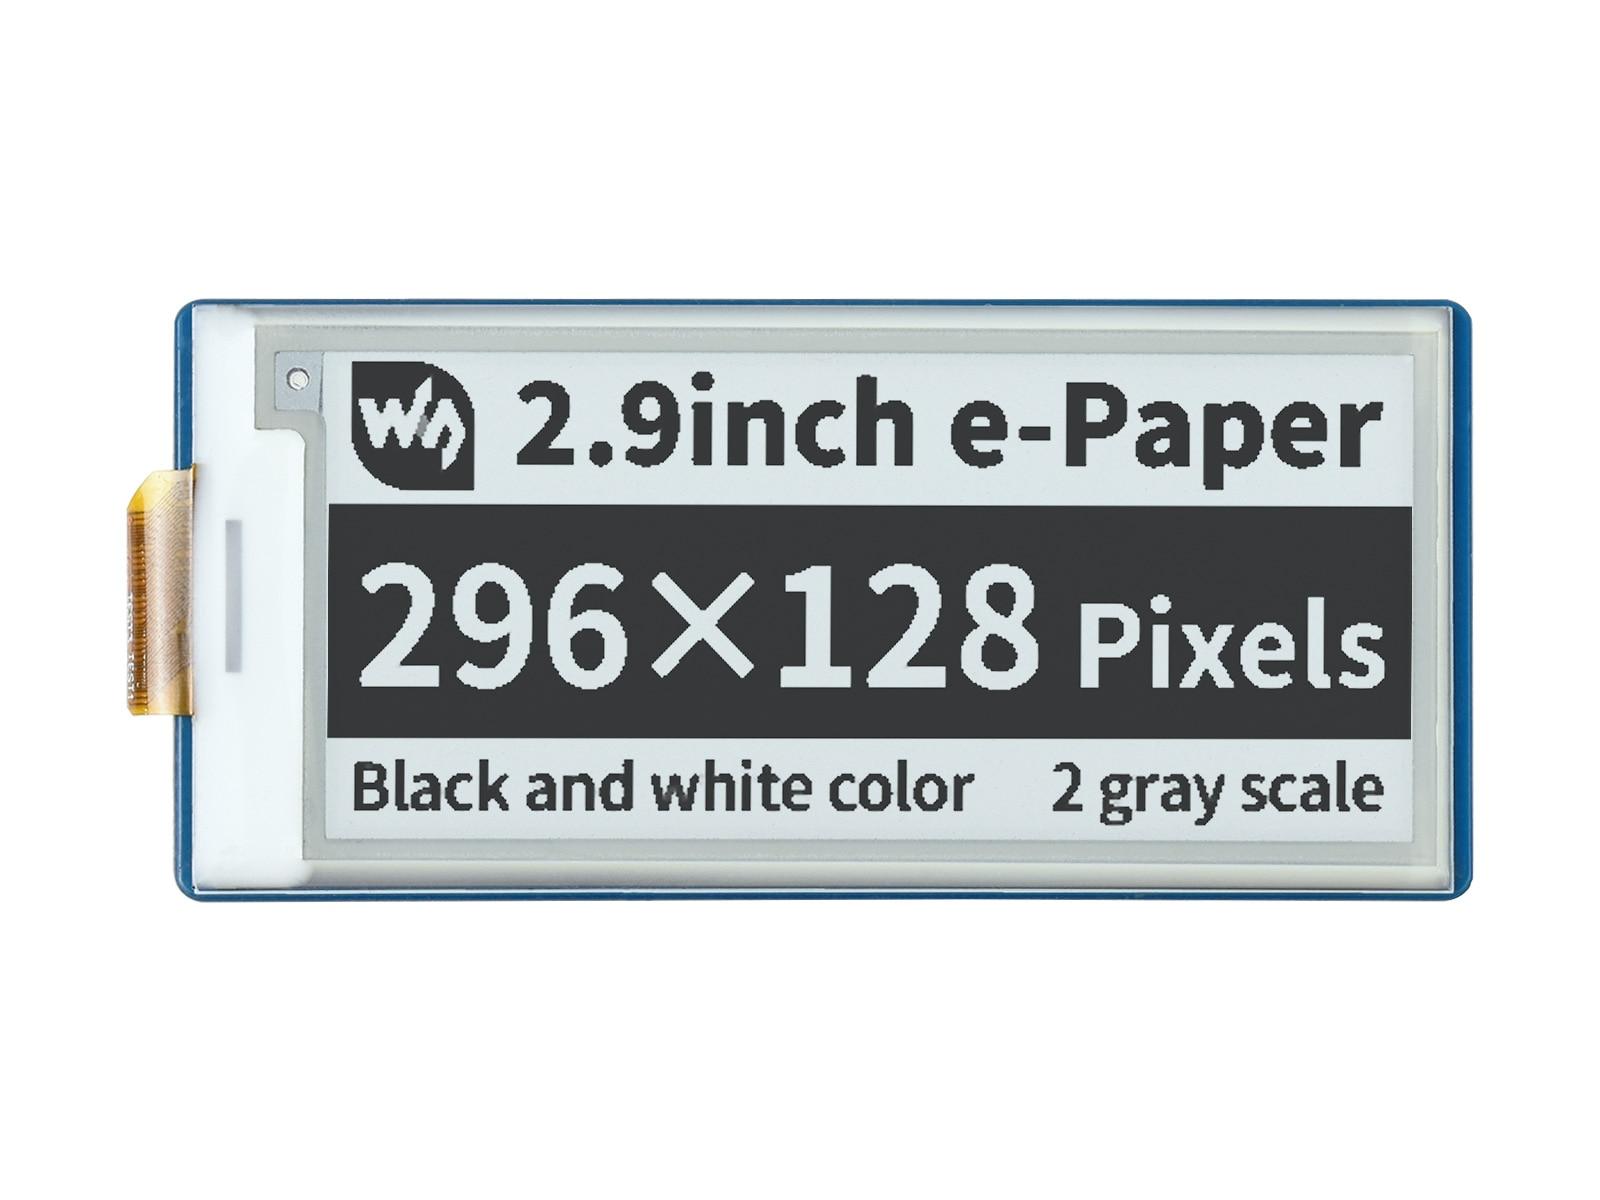 Waveshare-Módulo de pantalla de tinta electrónica, papel electrónico de 2,9 pulgadas para...